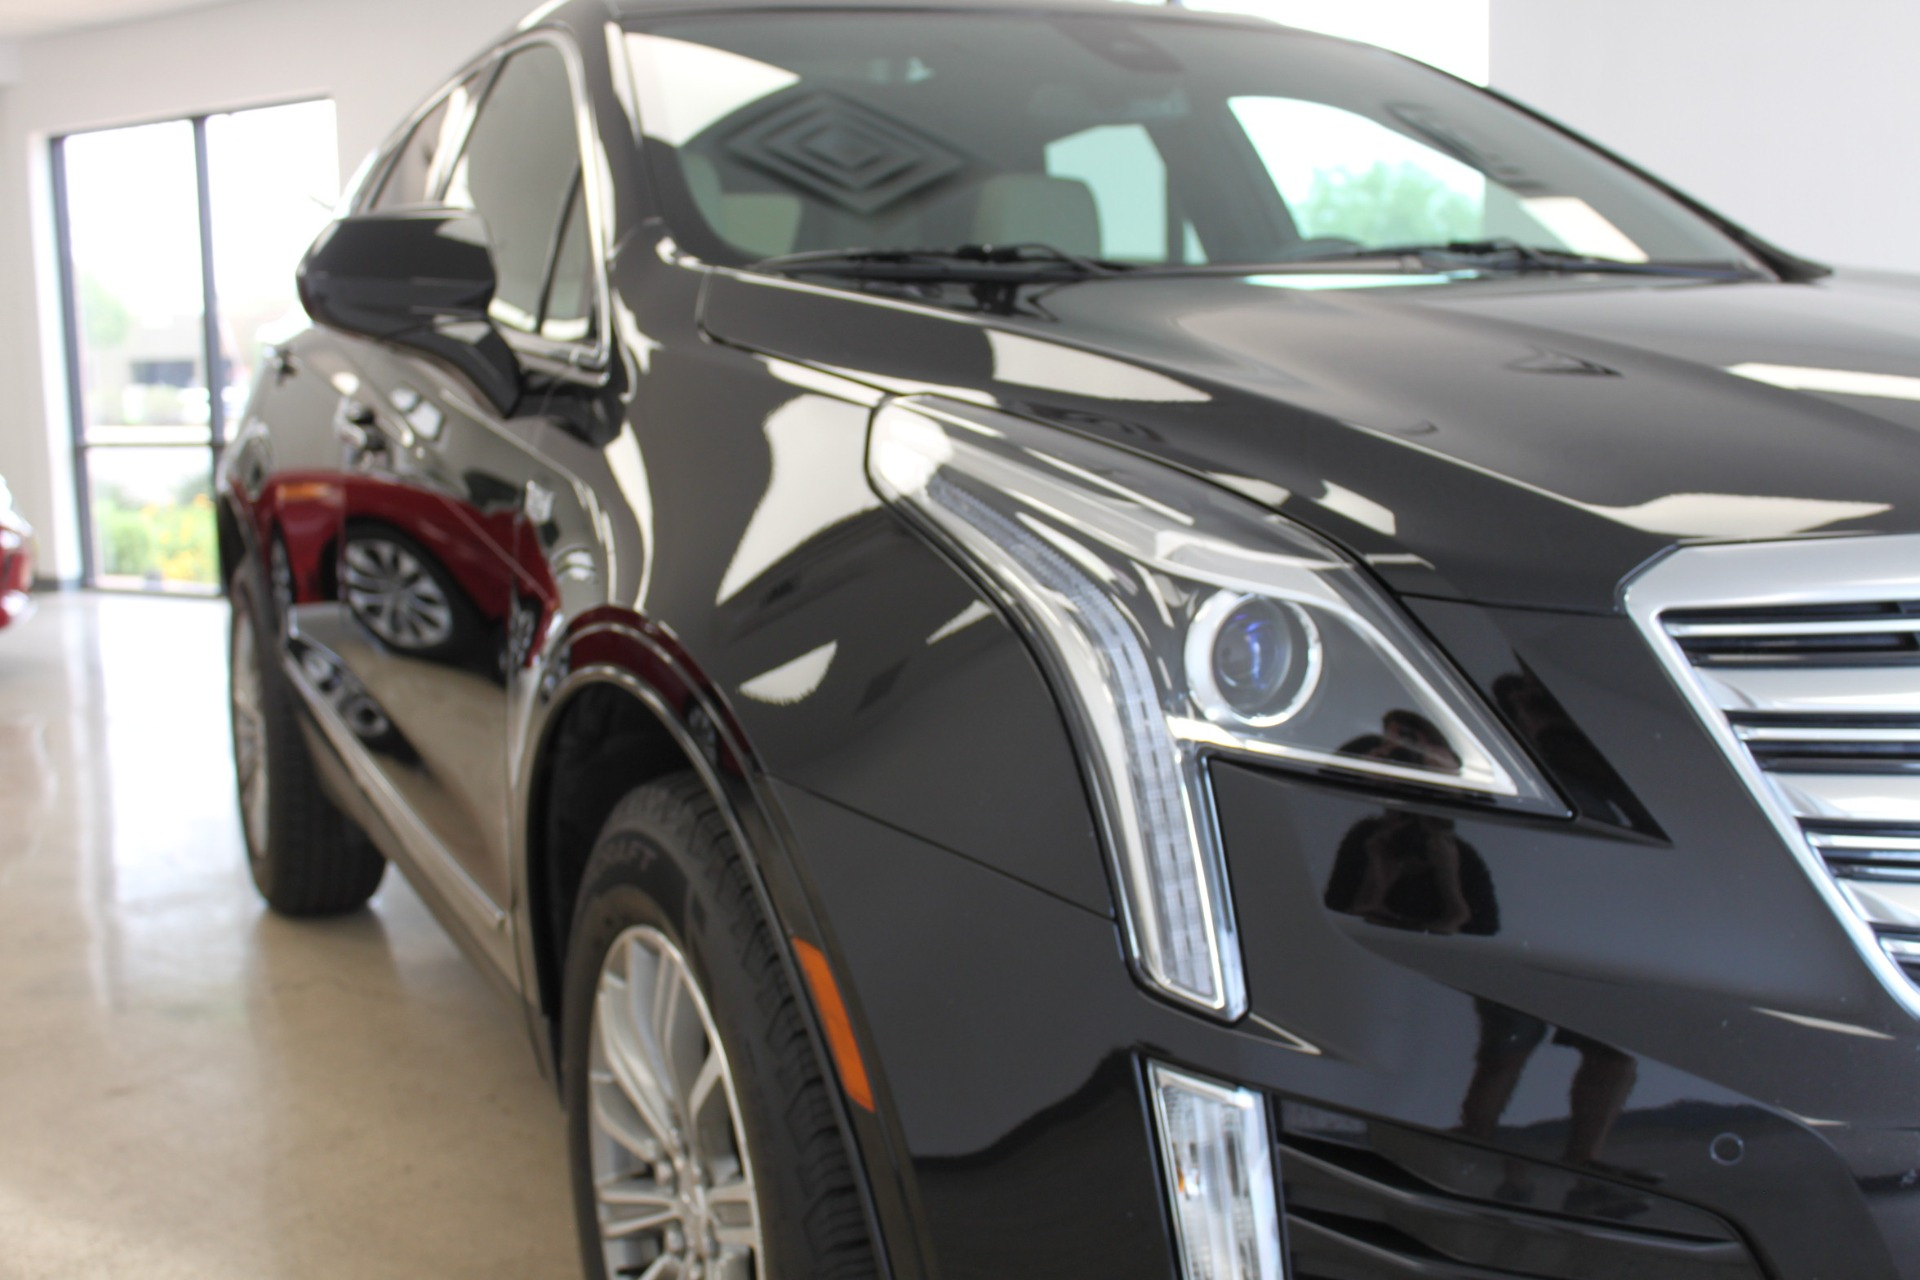 Used-2017-Cadillac-XT5-Luxury-All-Wheel-Drive-Luxury-AWD-Lexus